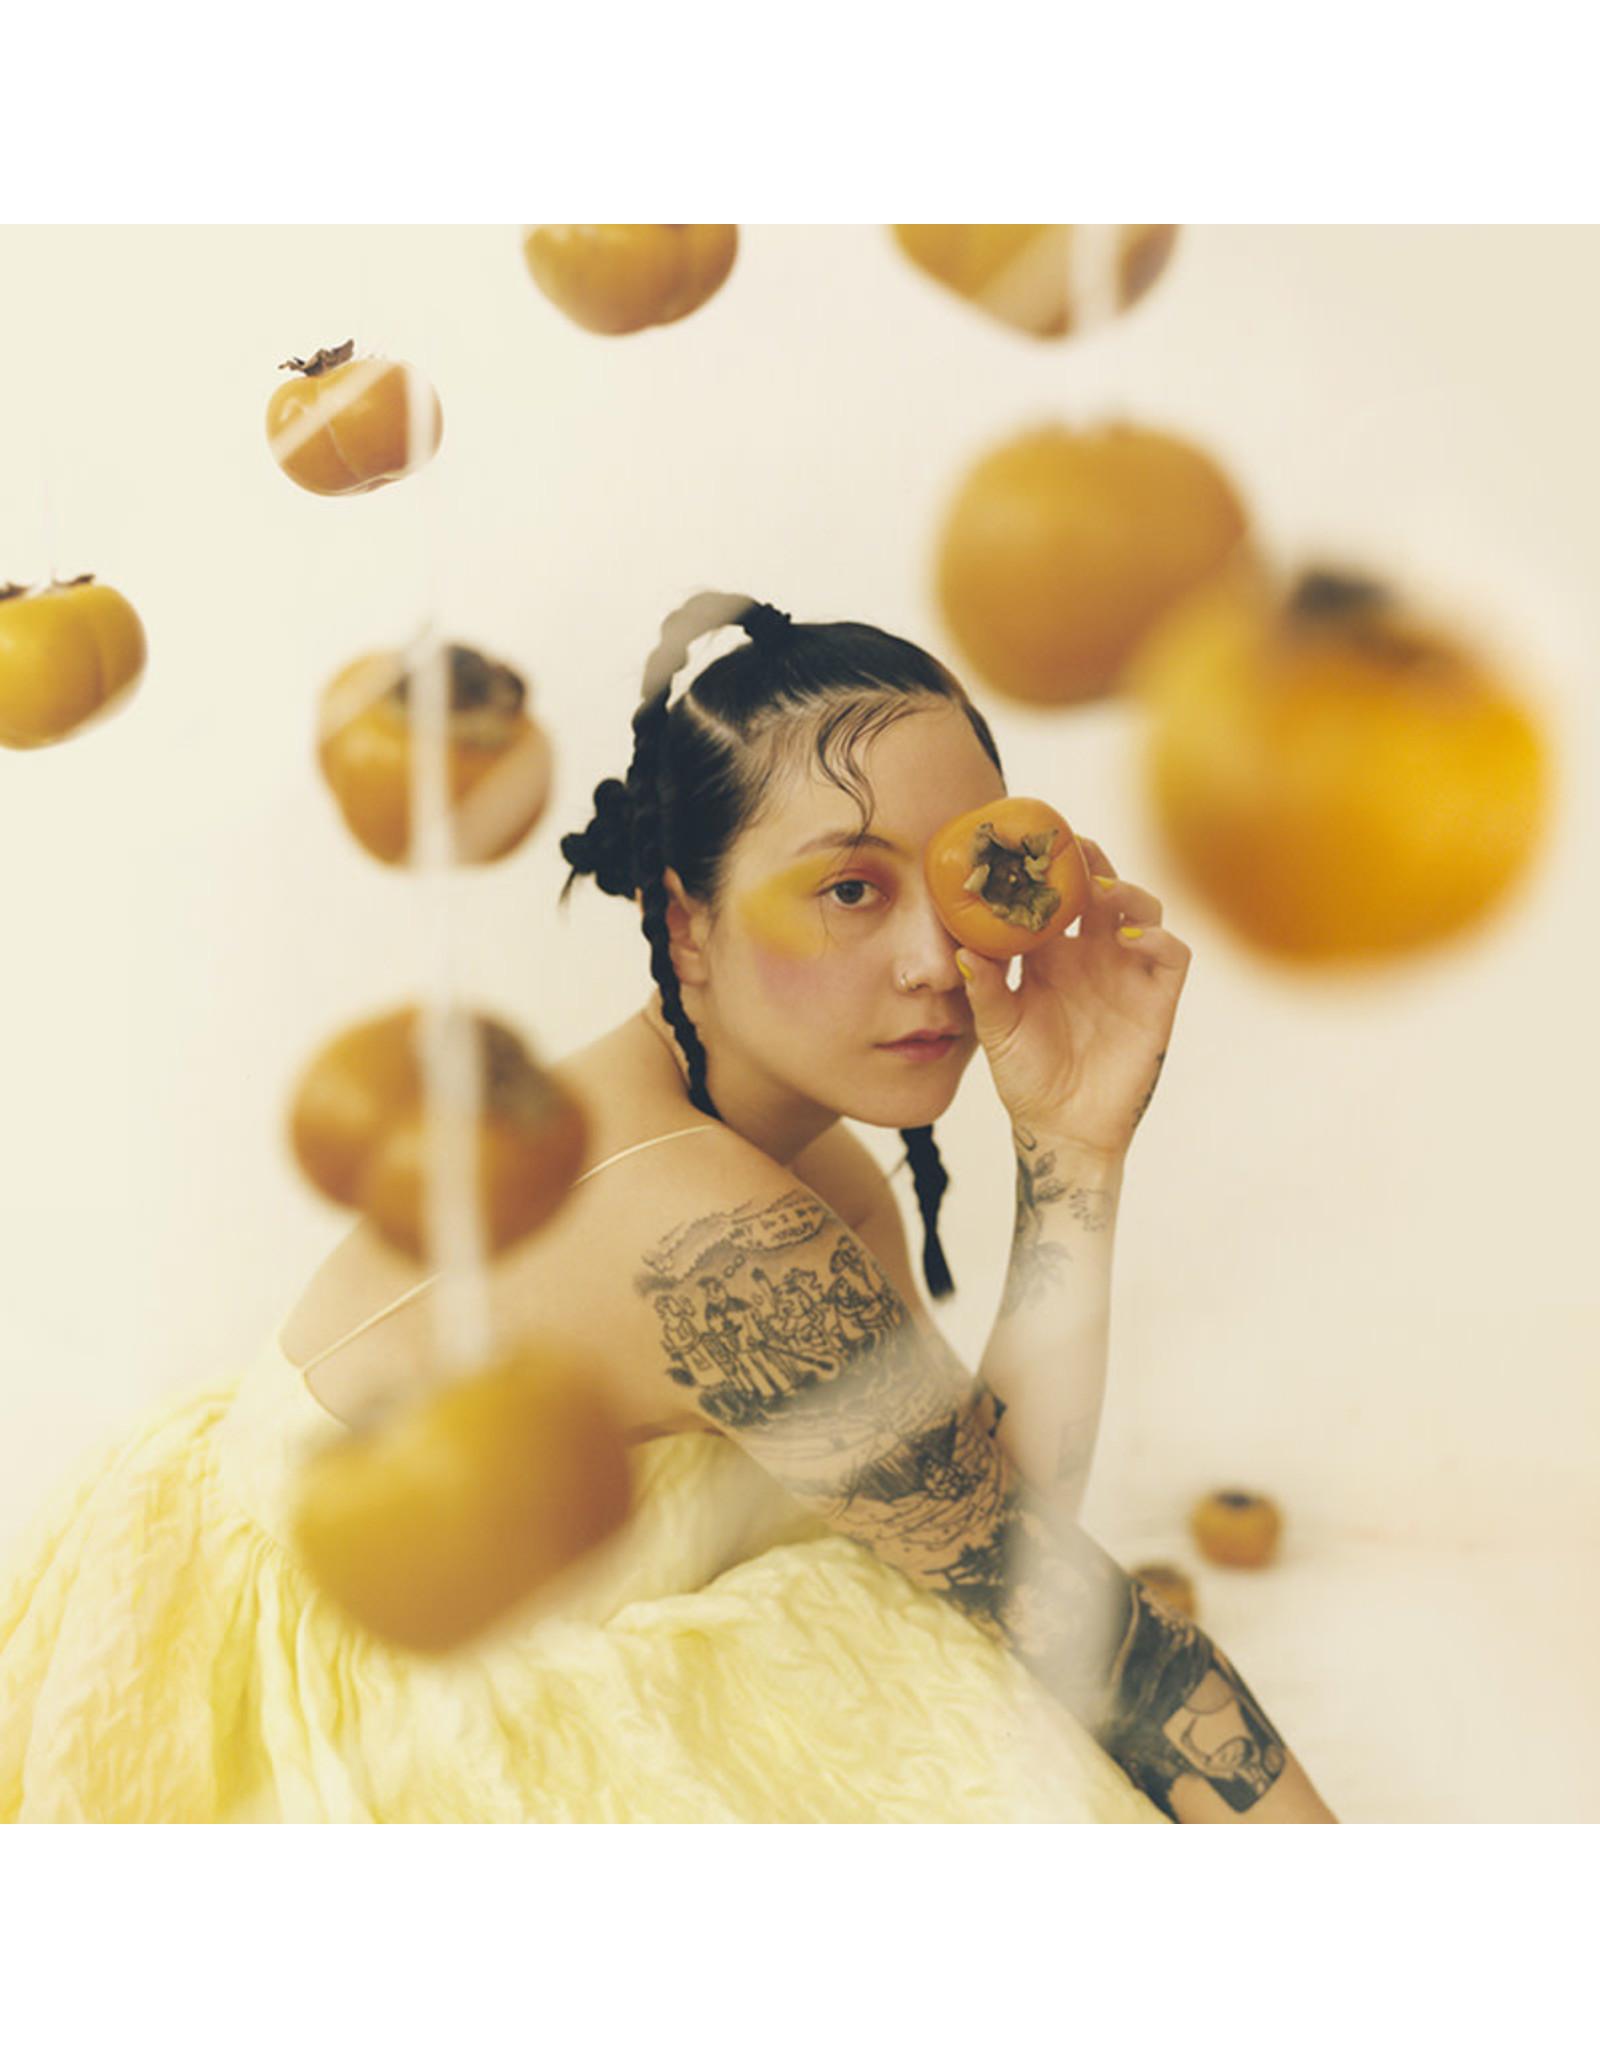 Japanese Breakfast - Jubilee (Exclusive Yellow Swirl Vinyl)